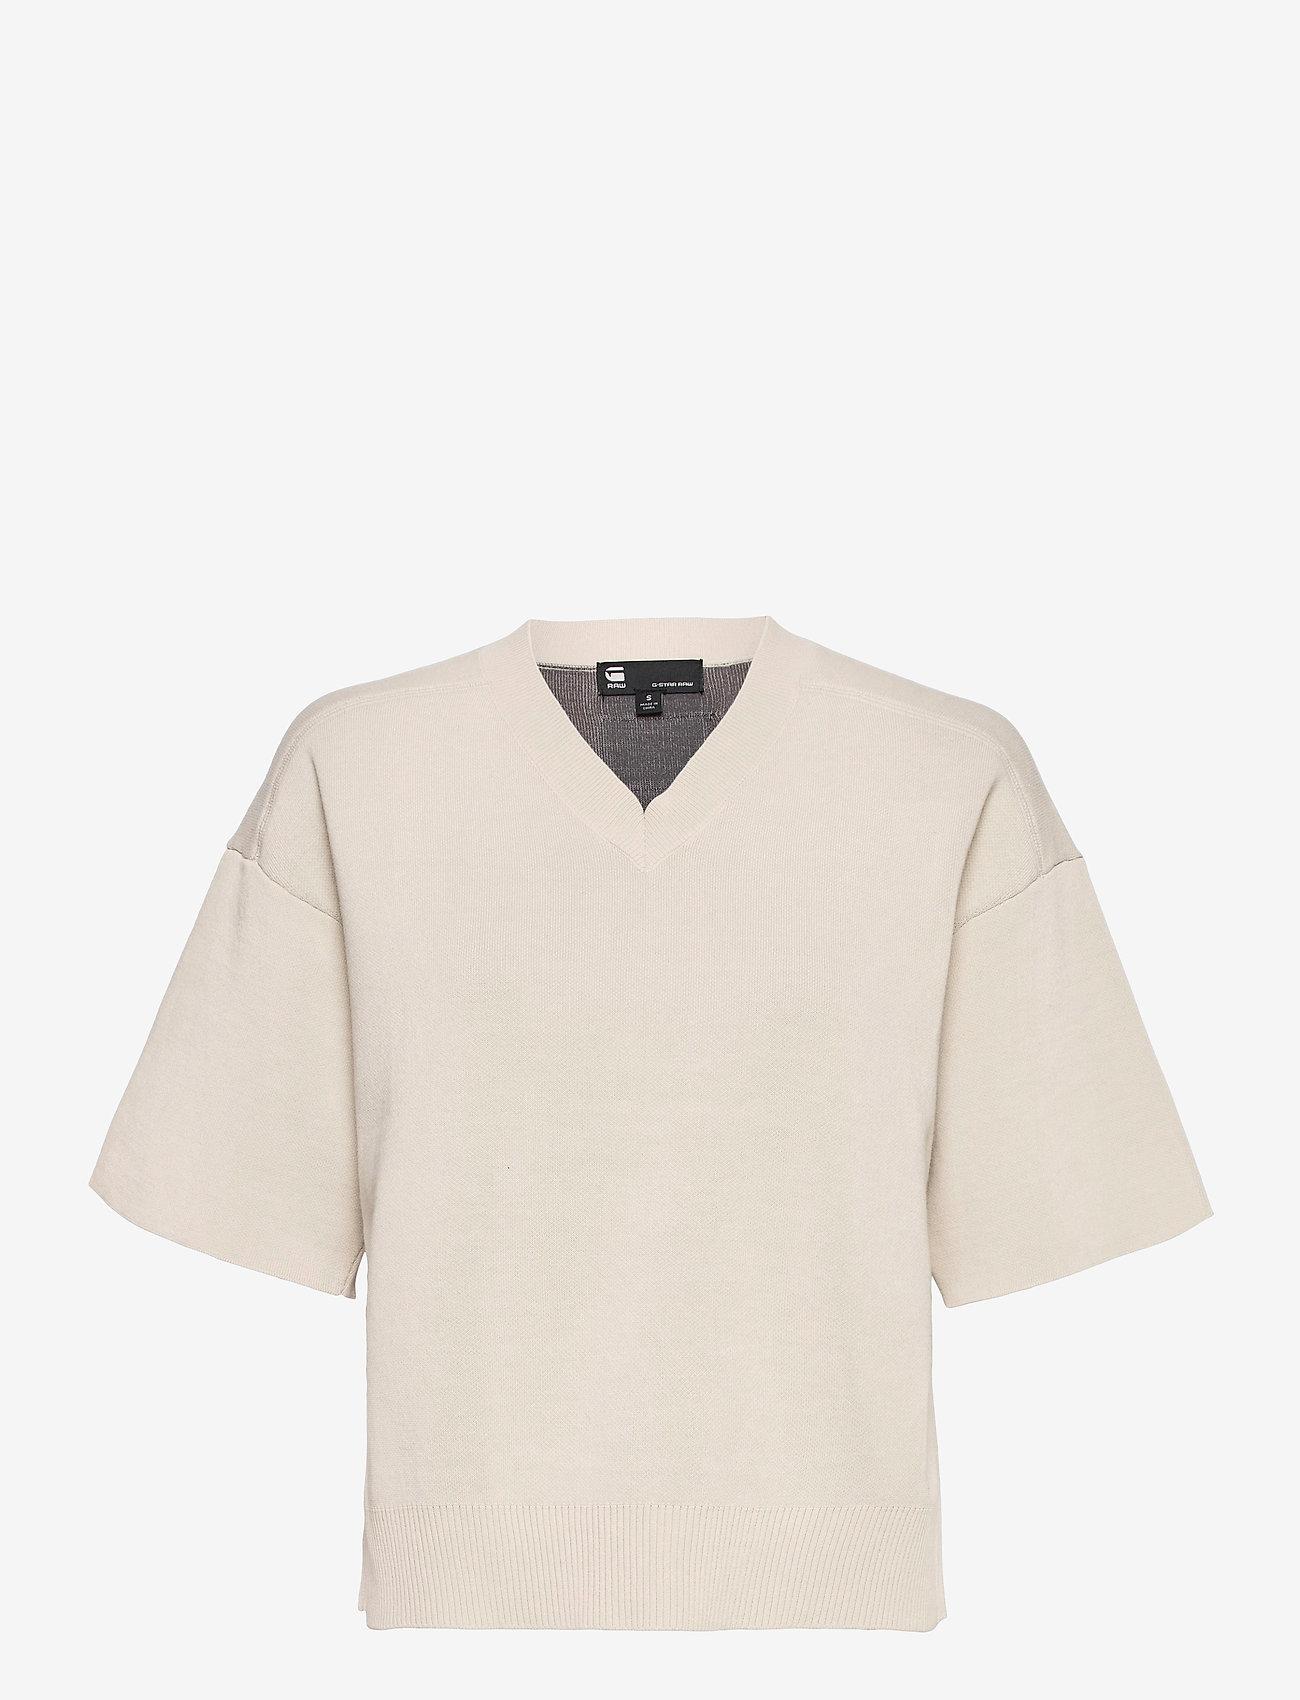 G-star RAW - Knitted v-neck tee - gebreide t-shirts - whitebait/carbid - 0